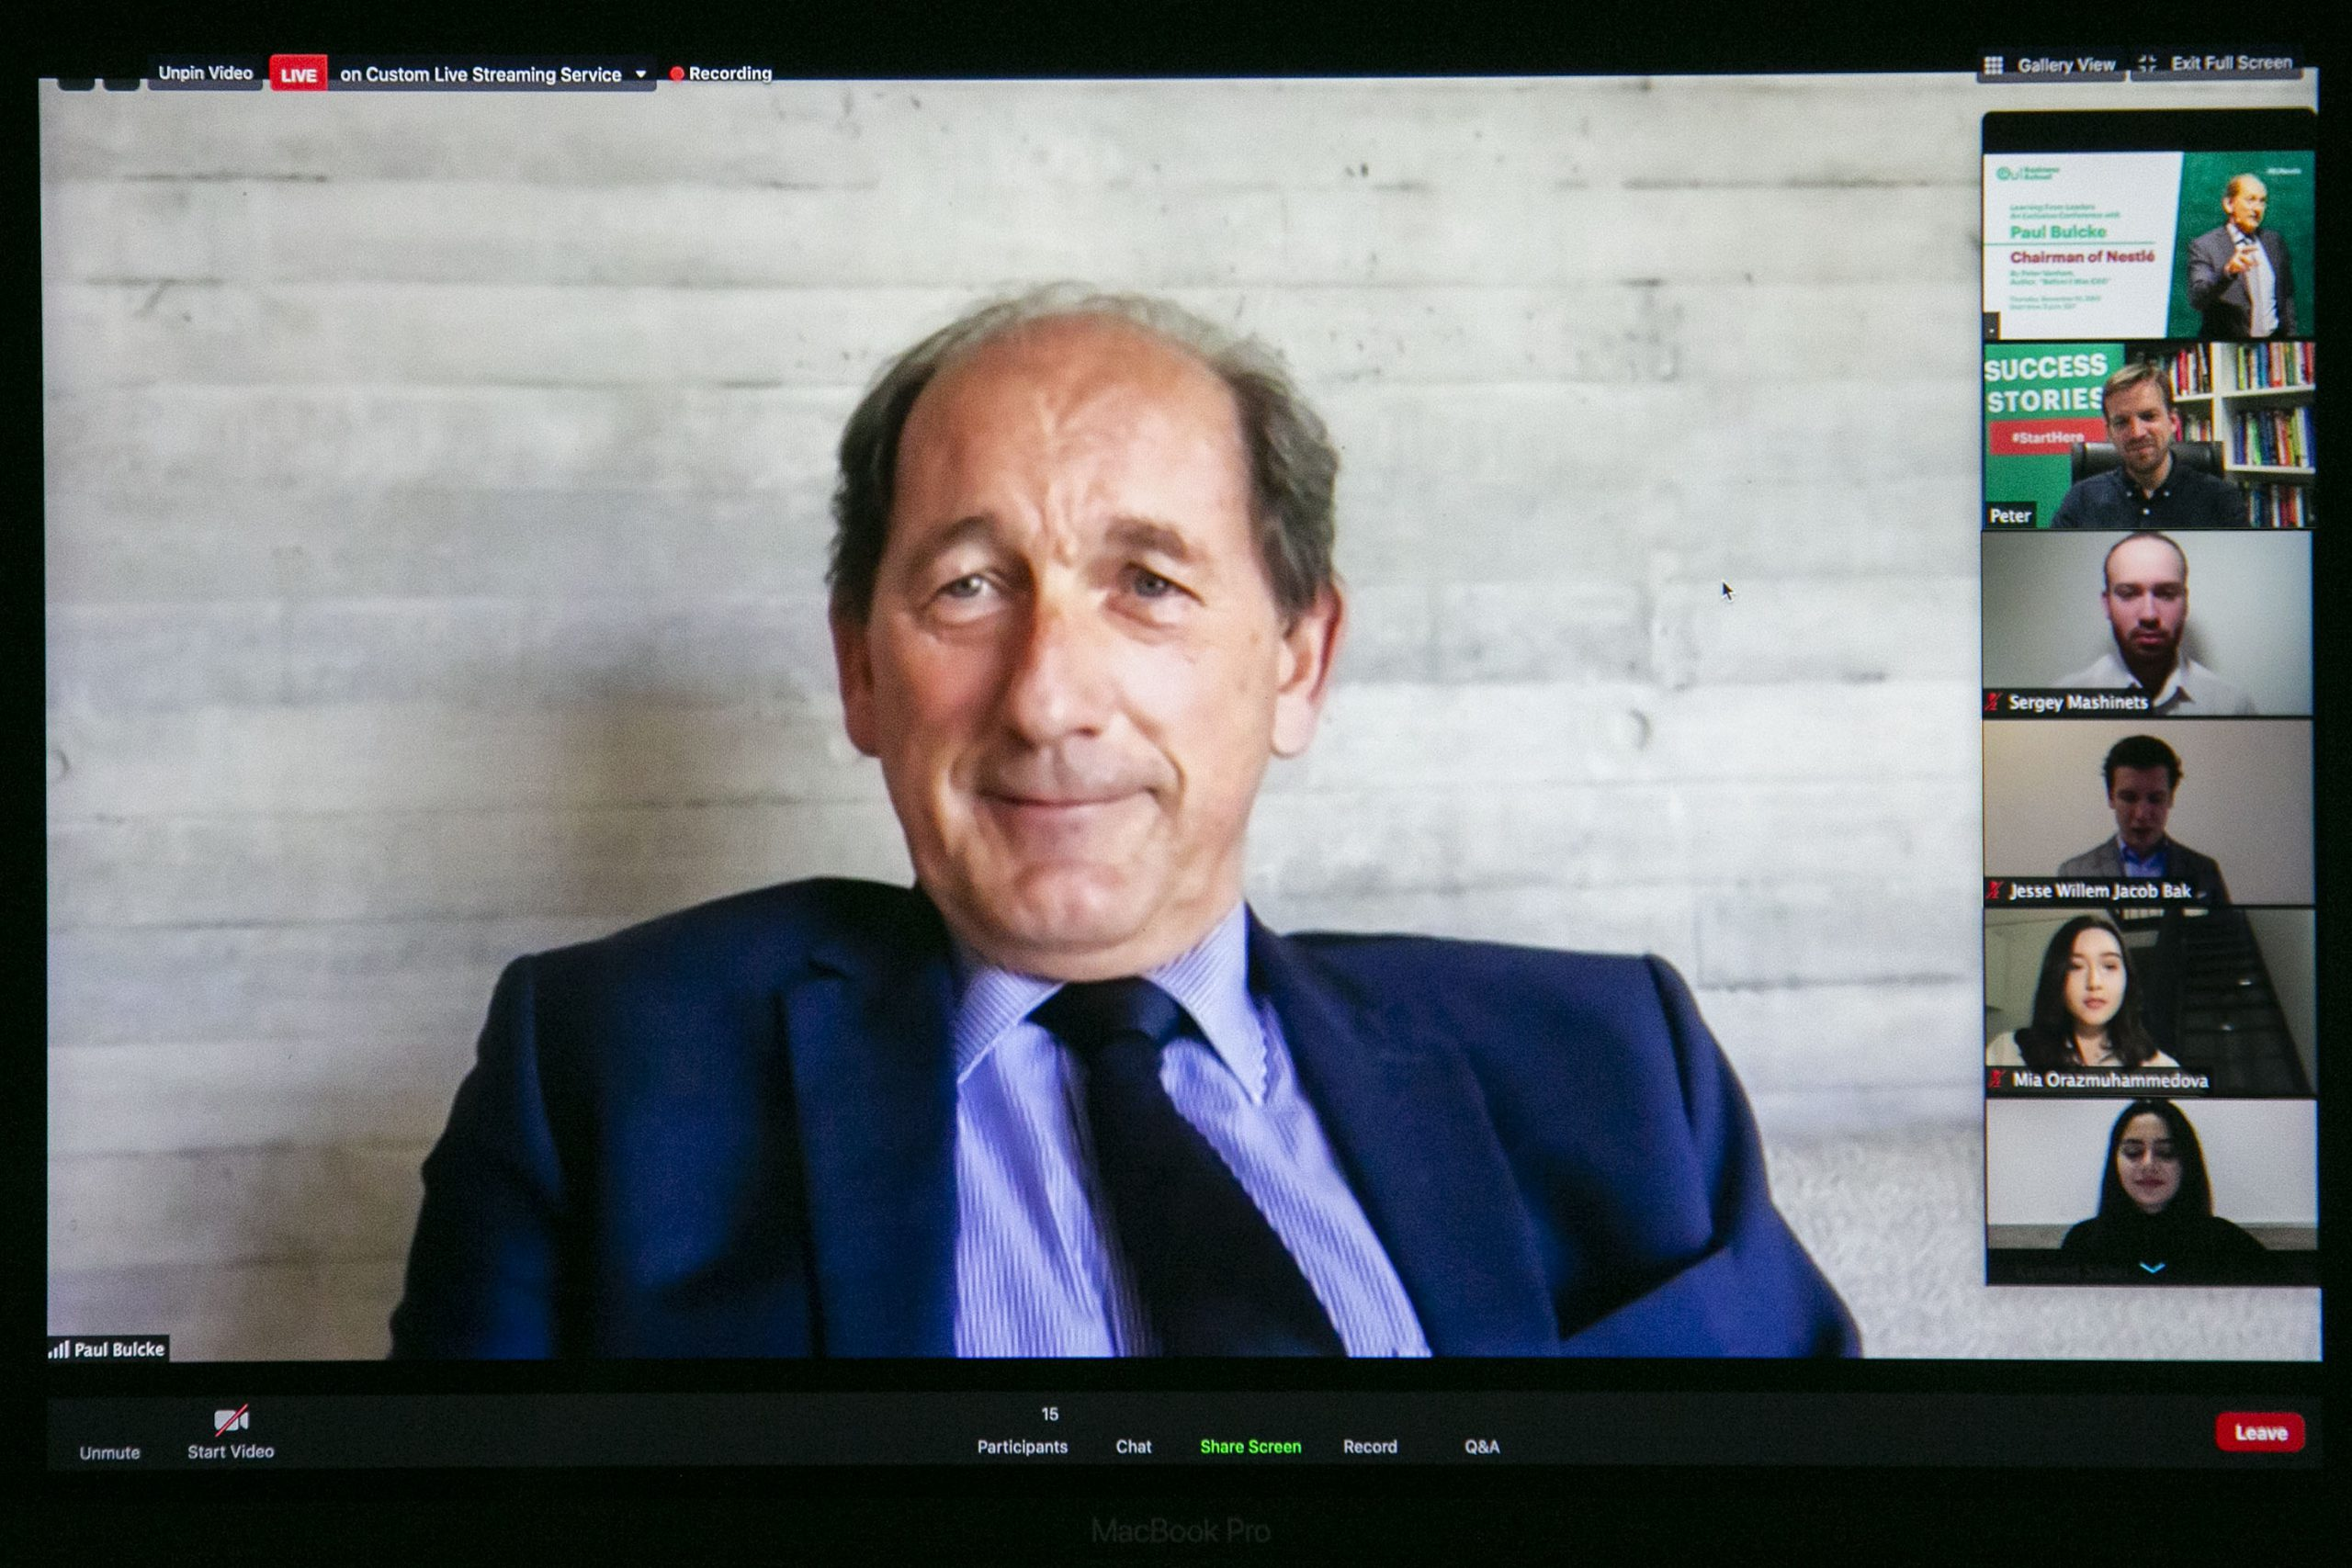 Paul Bulcke - Nestlé